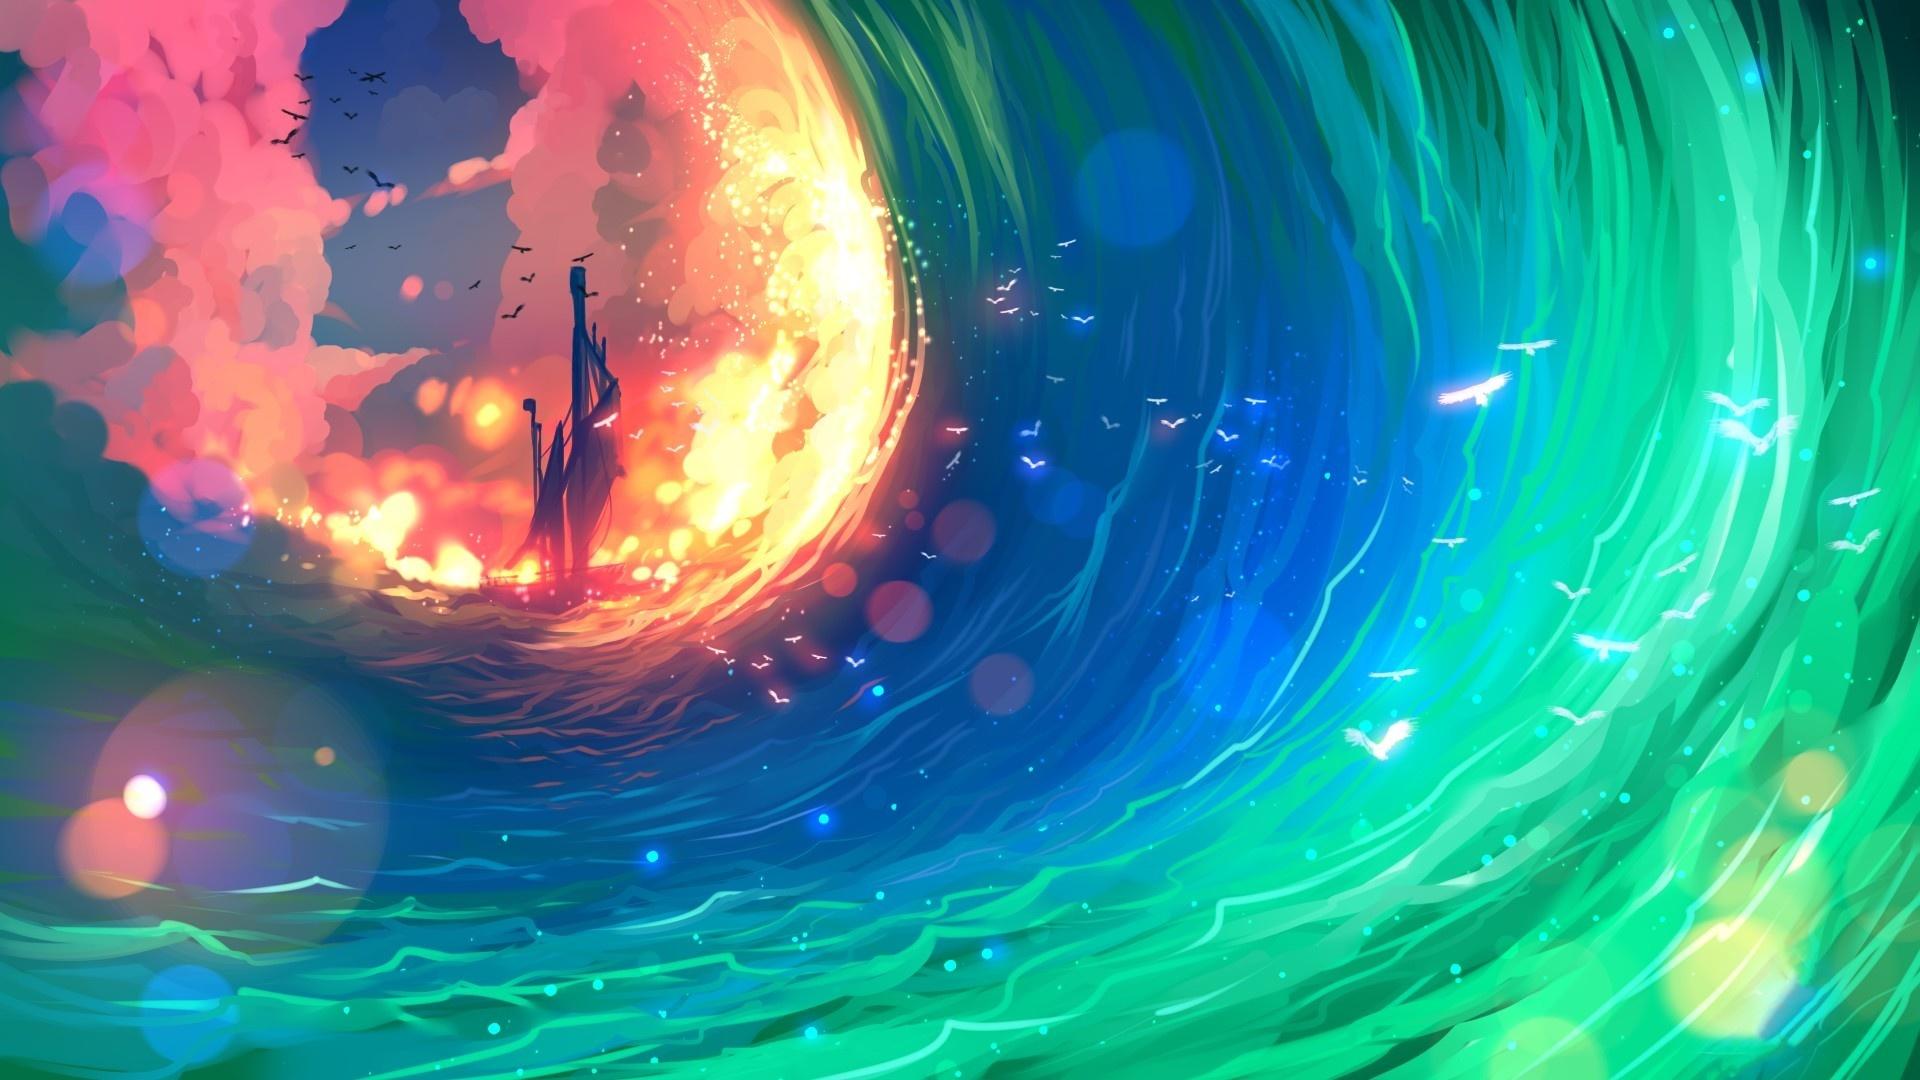 Desktop Wallpaper Ship, Colorful, Sea Waves, Anime, Art ...